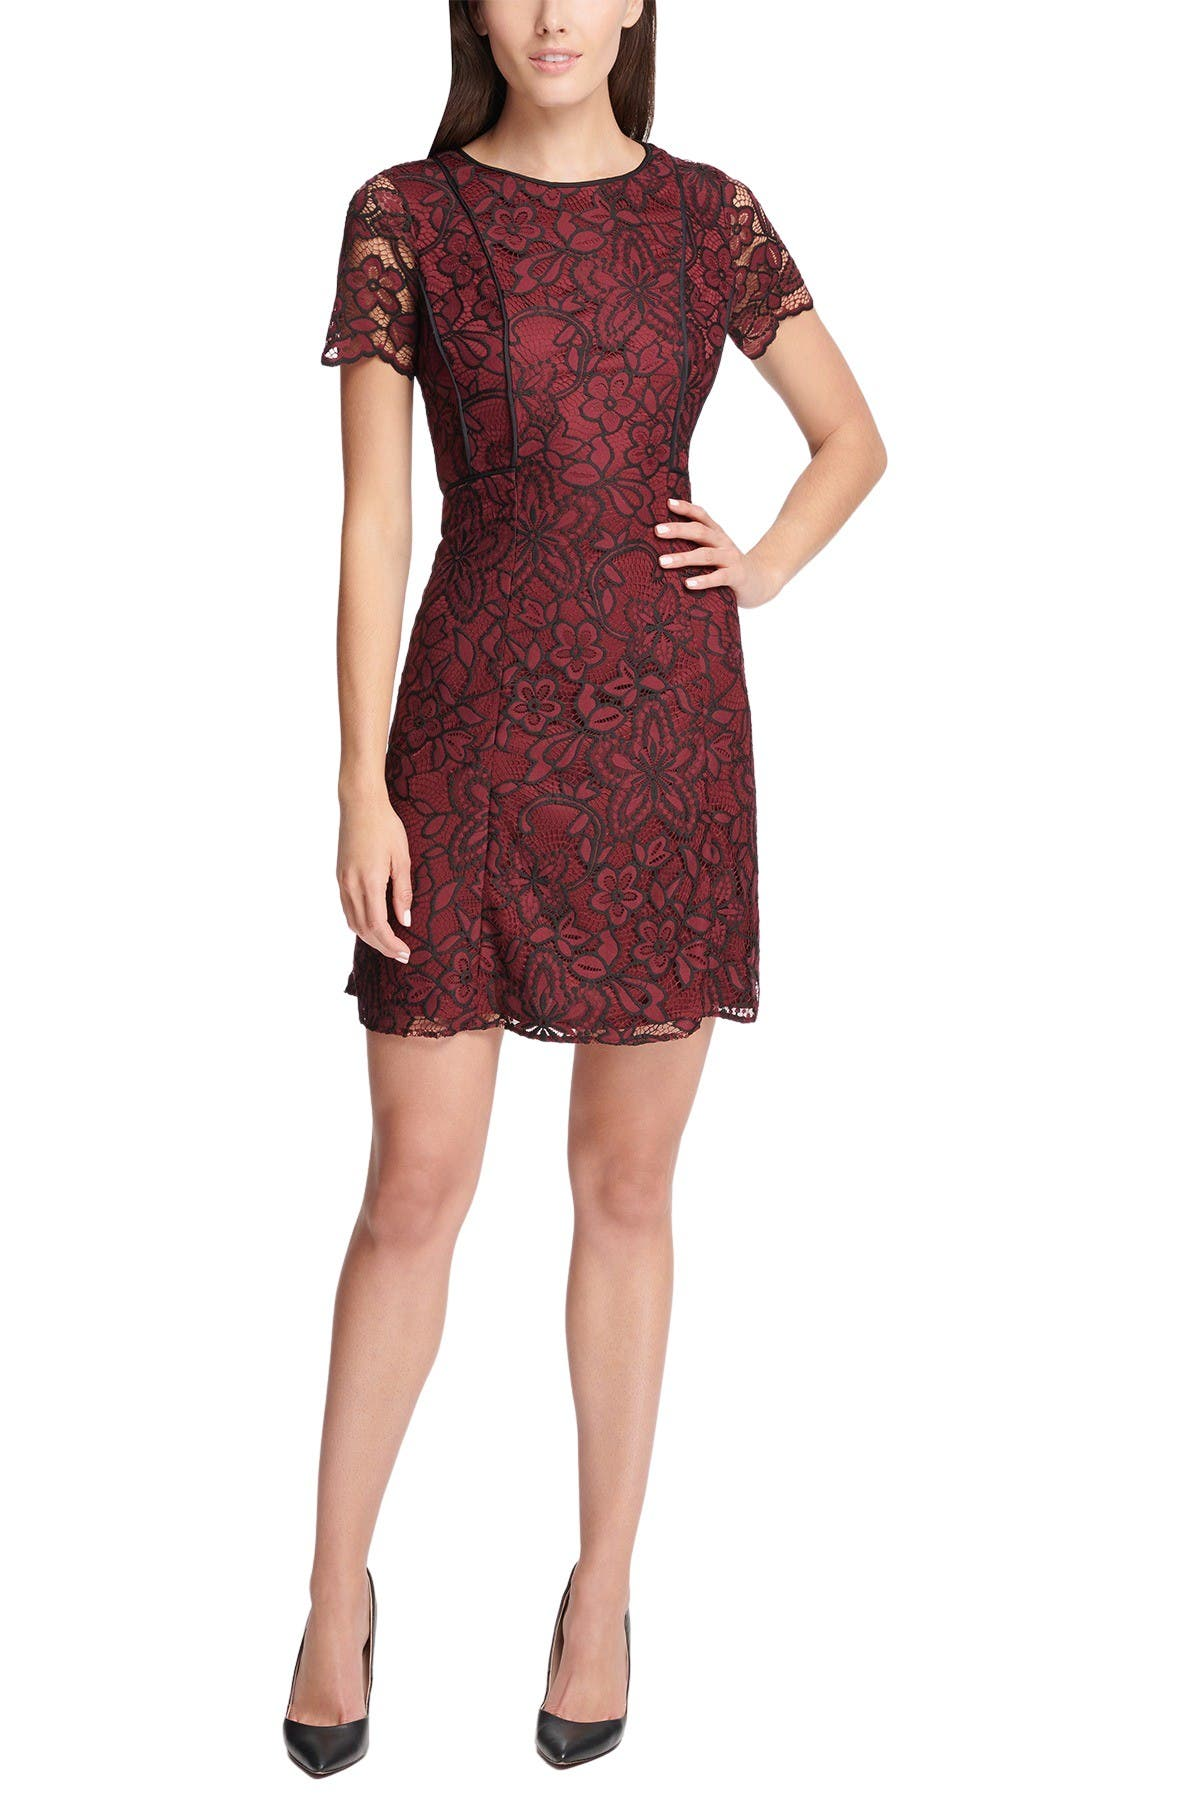 Image of Kensie Floral Crochet Lace Sheath Dress